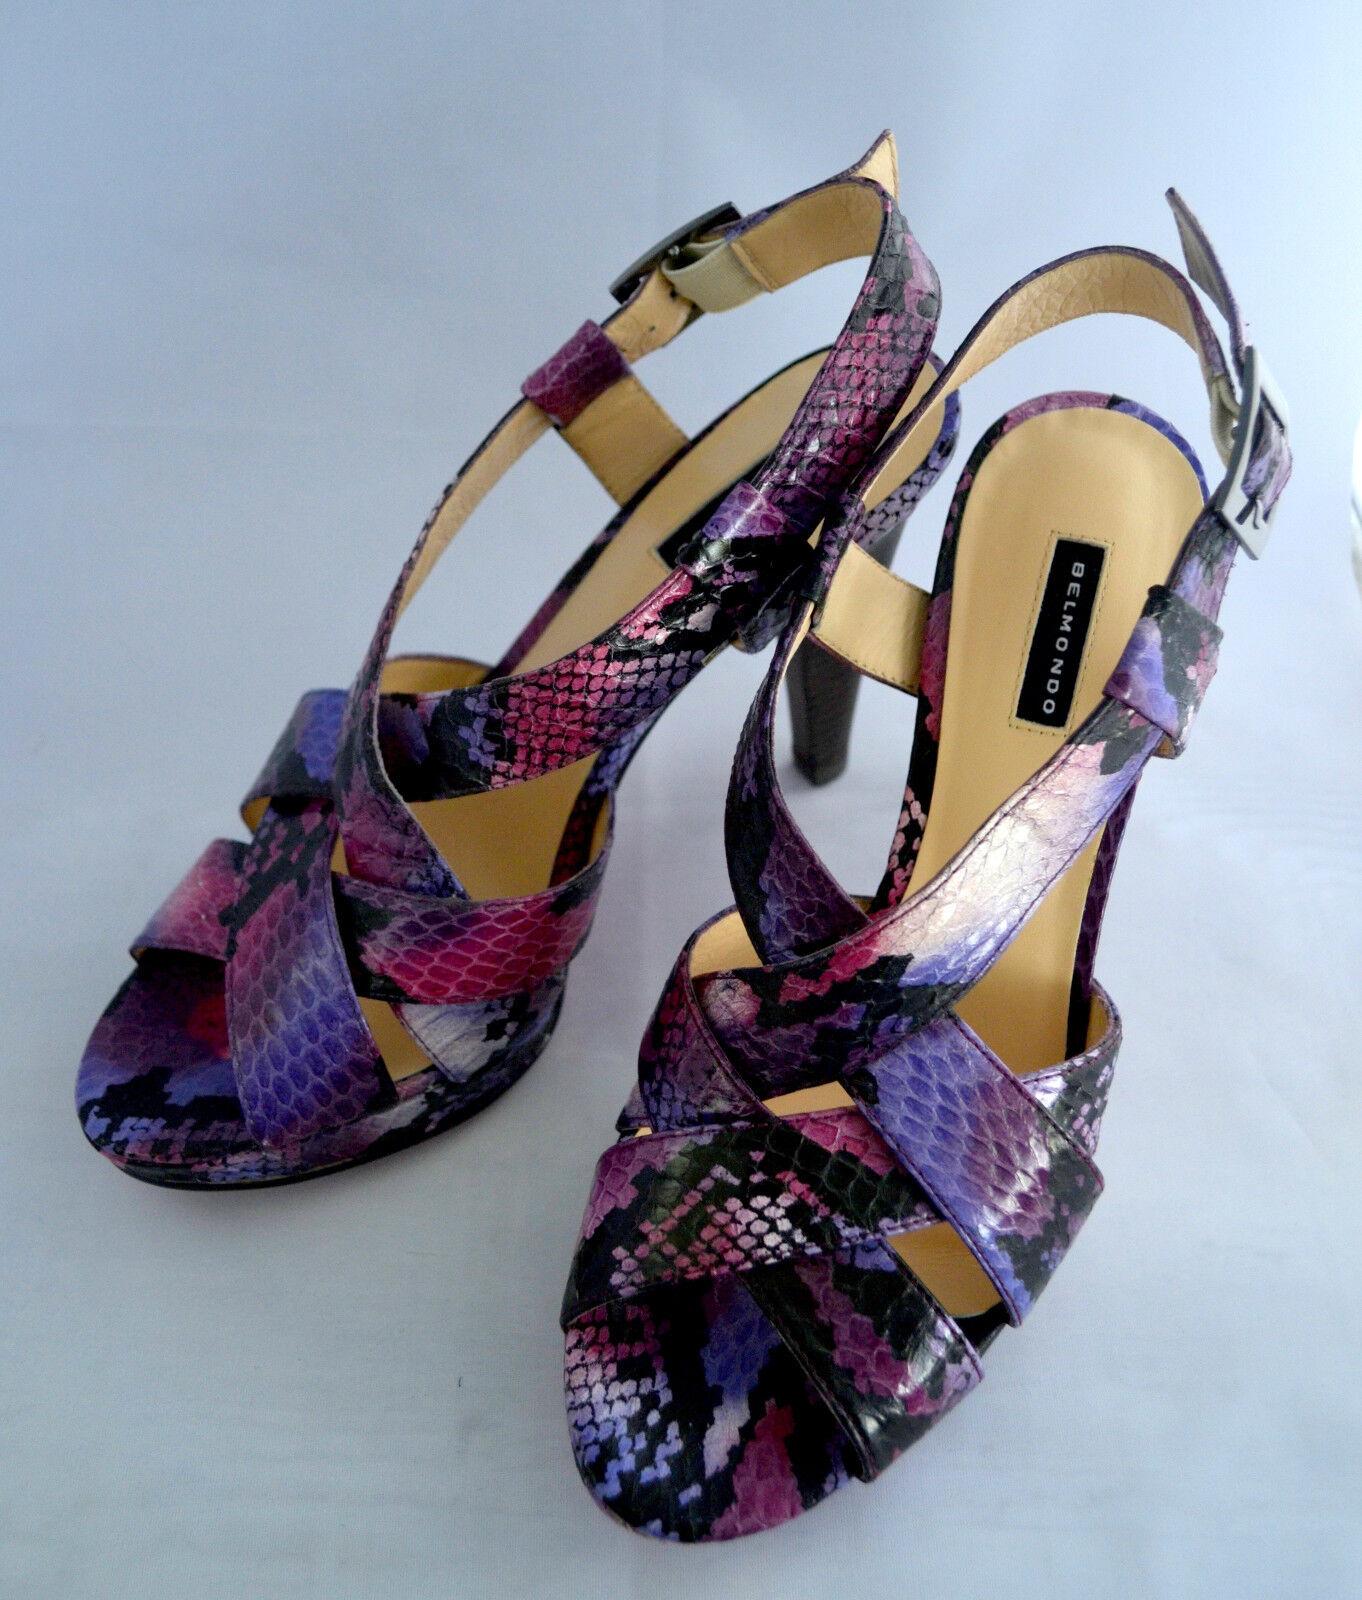 BELMONDO Damen Highheel-Sandaleetten Leder Rosa Pink Blau Gr.40